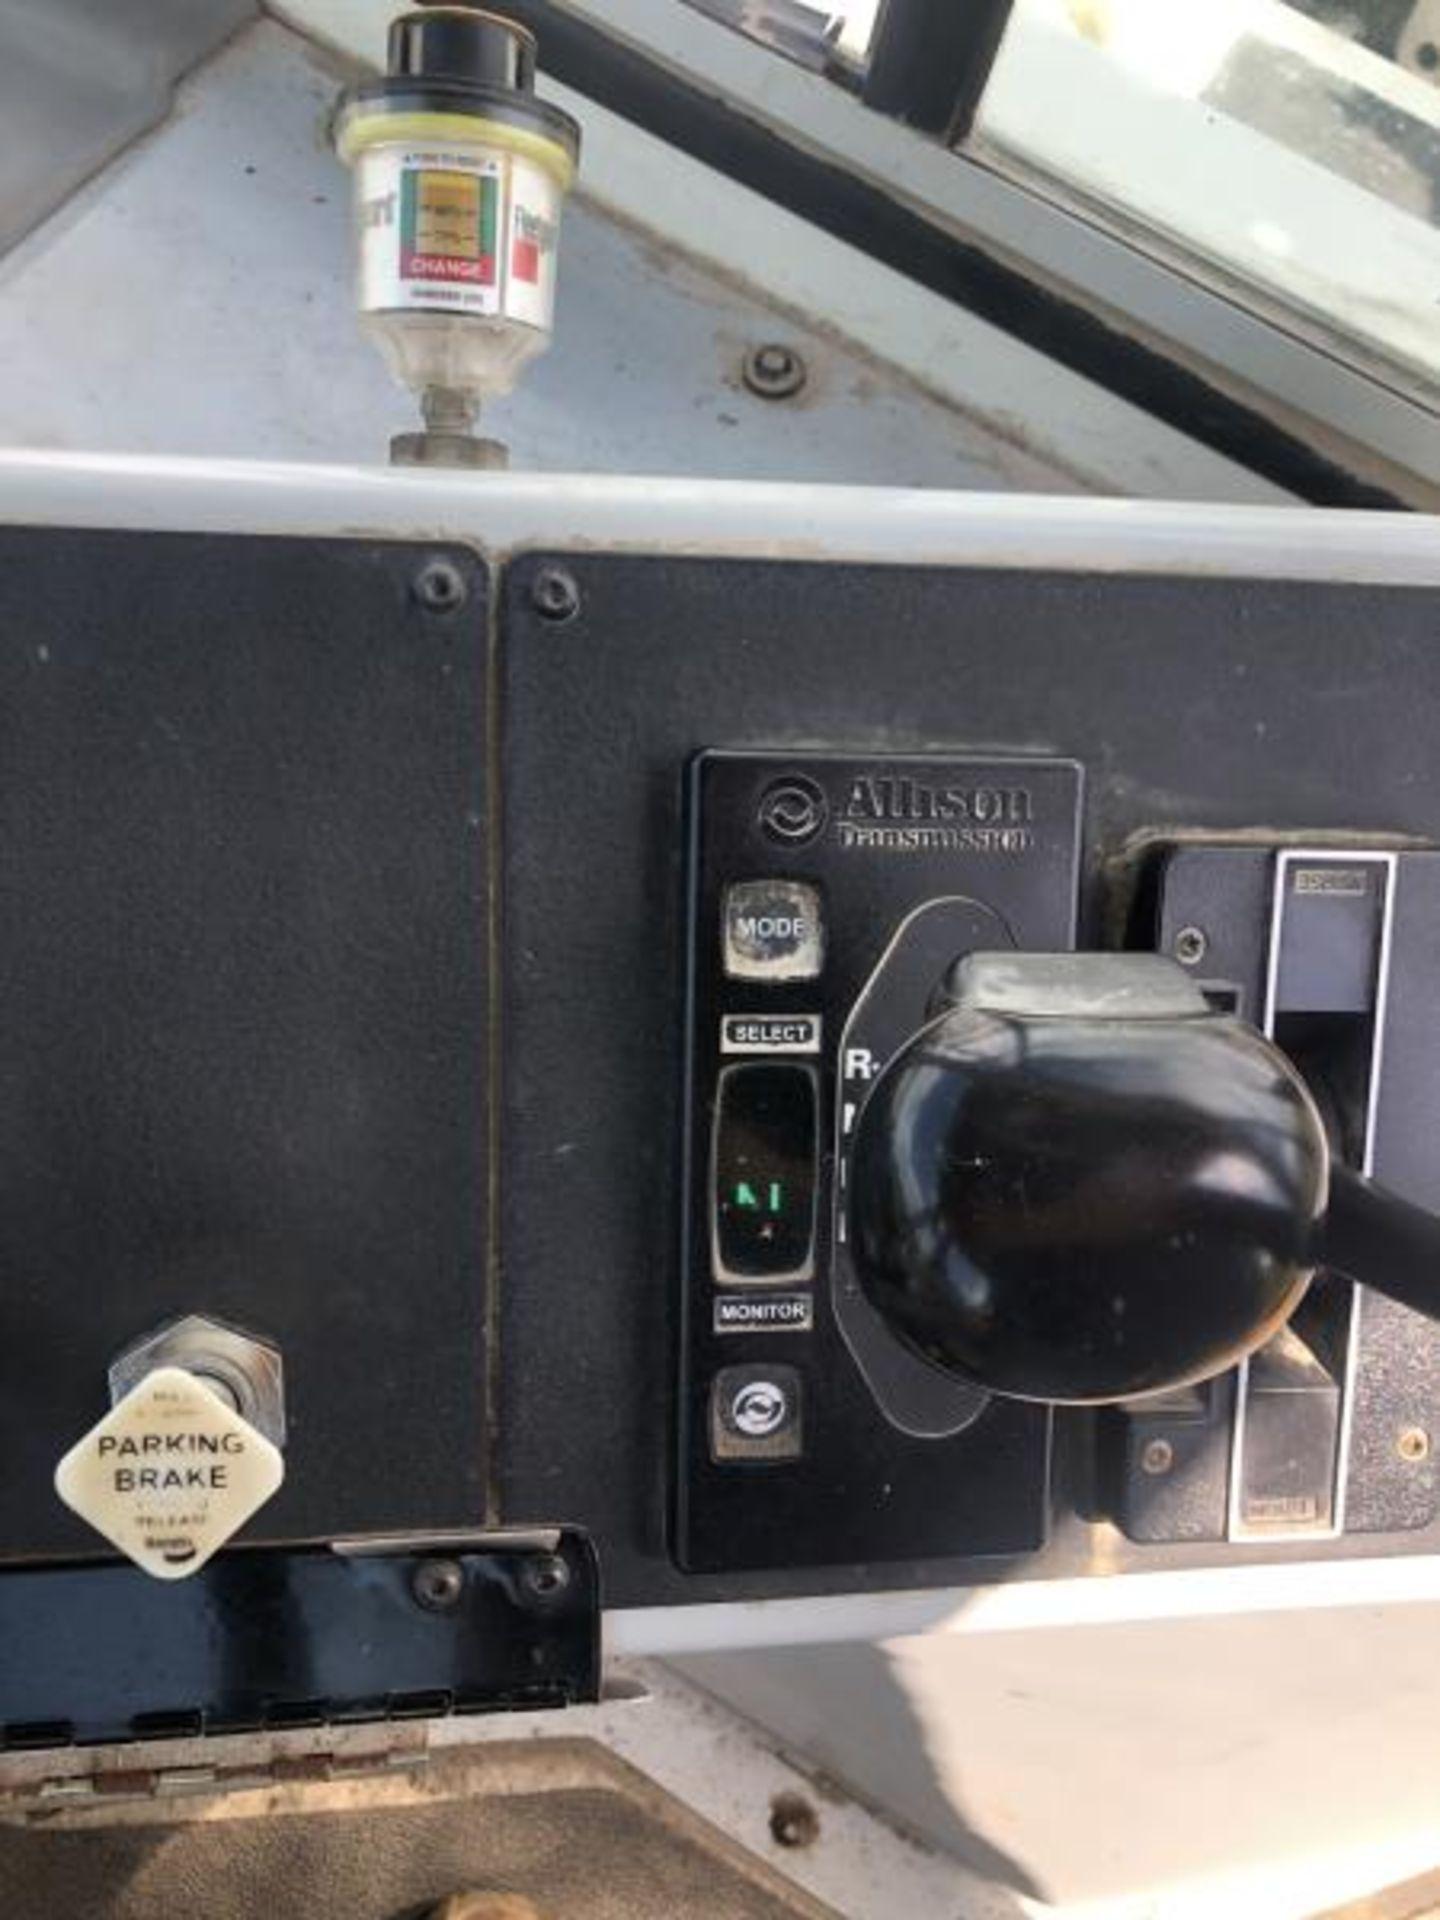 2015 Kalmar Ottawa 4x2 Yard Truck , SN: 338842 1,308.2 Hours, 937 Miles - Image 20 of 27